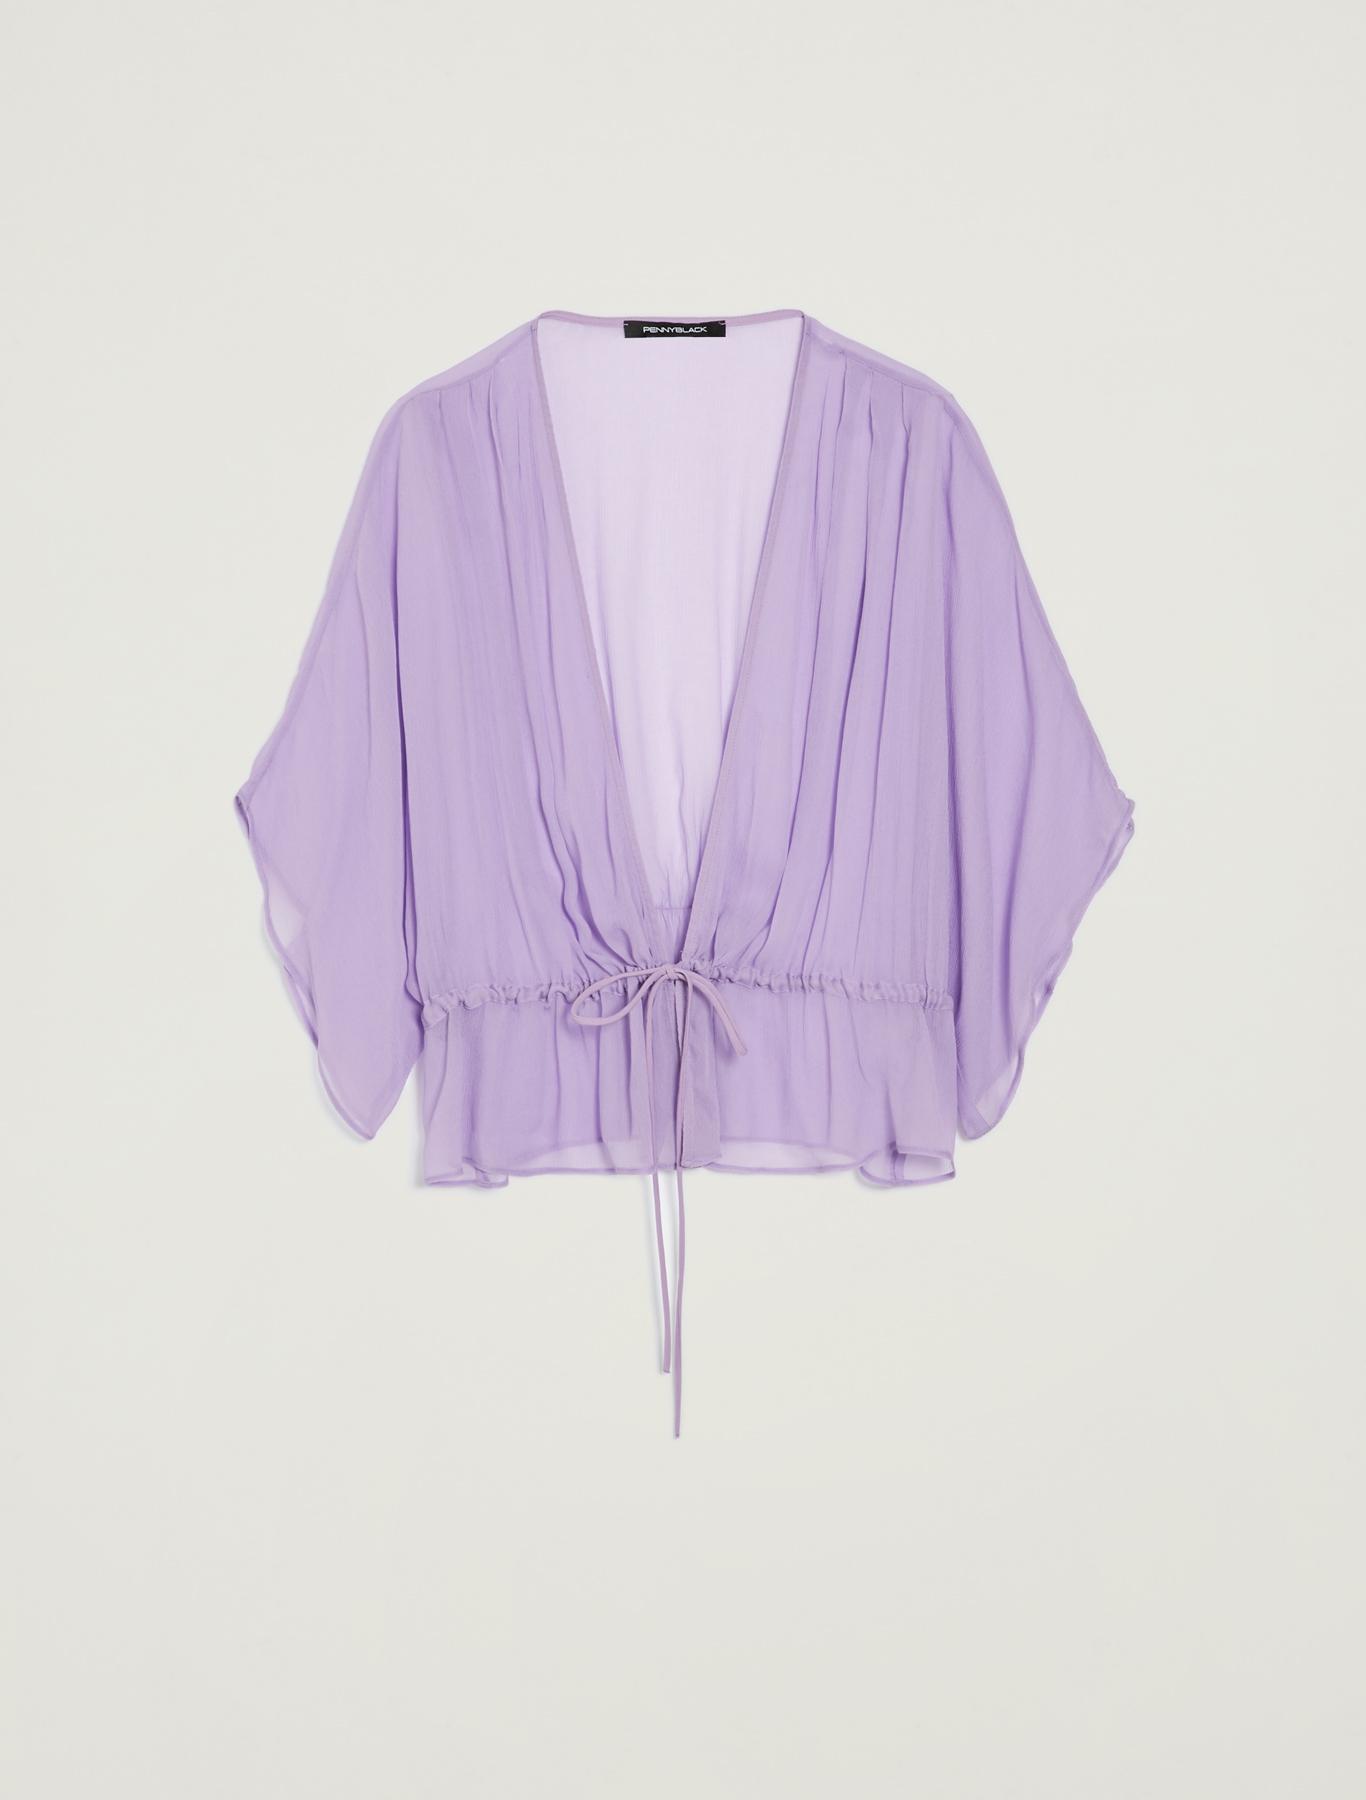 Kimono shrug with drawstring - lilac - pennyblack